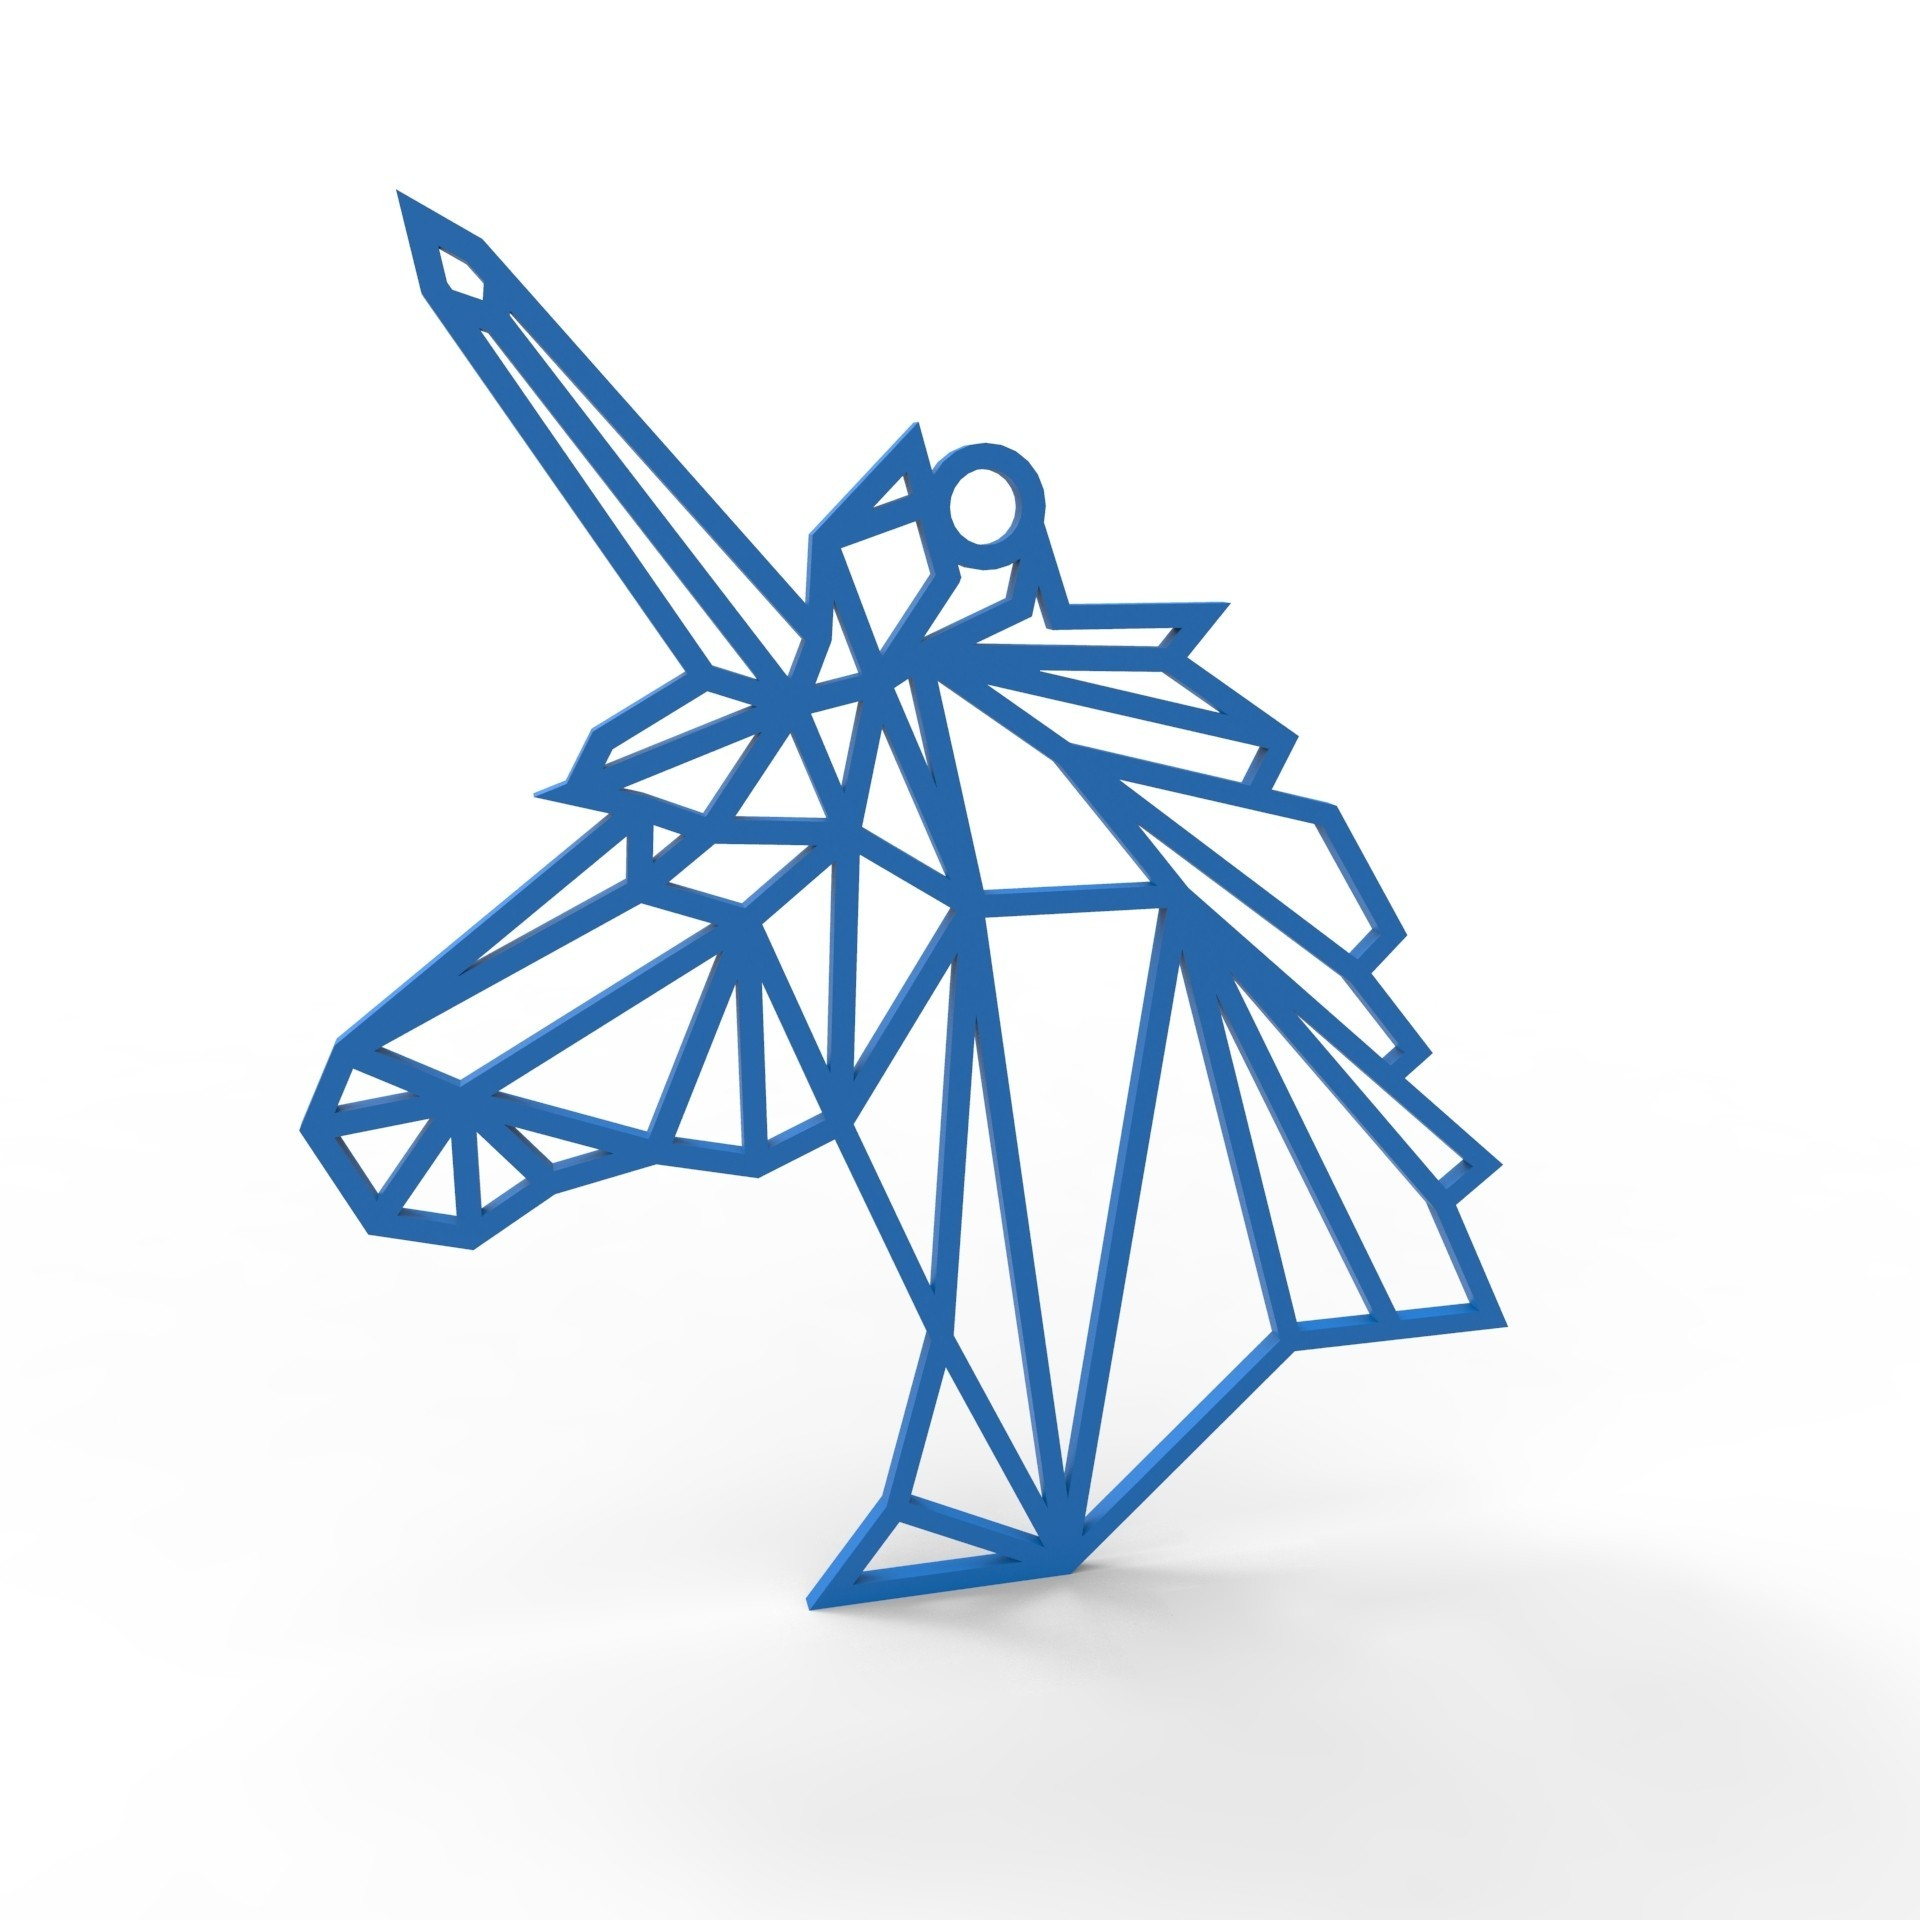 unicorn necklace.jpg Download STL file Unicorn Necklace • 3D printer object, TutoSolid